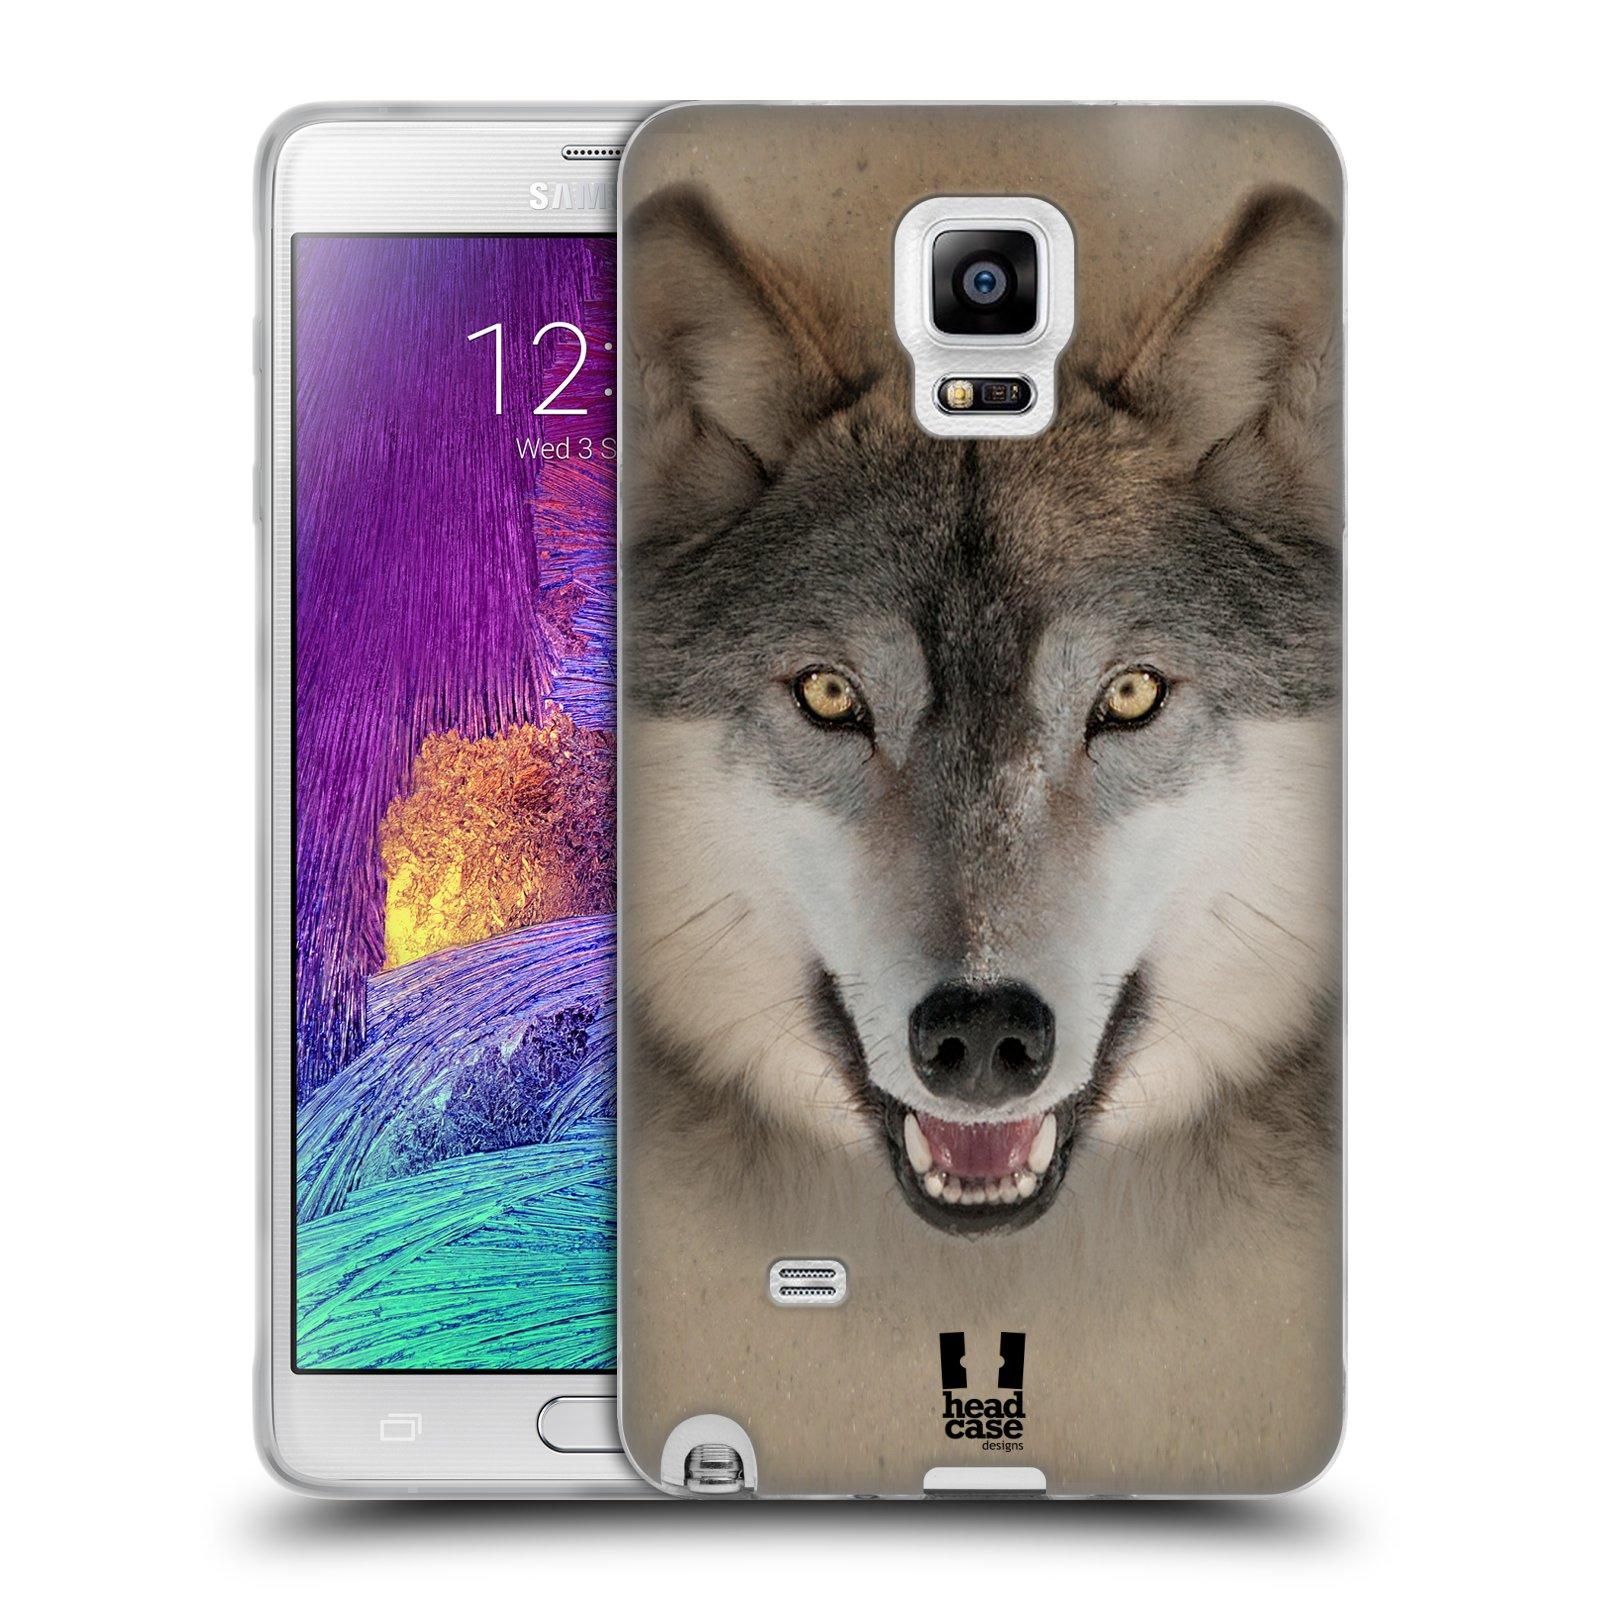 HEAD CASE silikonový obal na mobil Samsung Galaxy Note 4 (N910) vzor Zvířecí tváře 2 vlk šedý